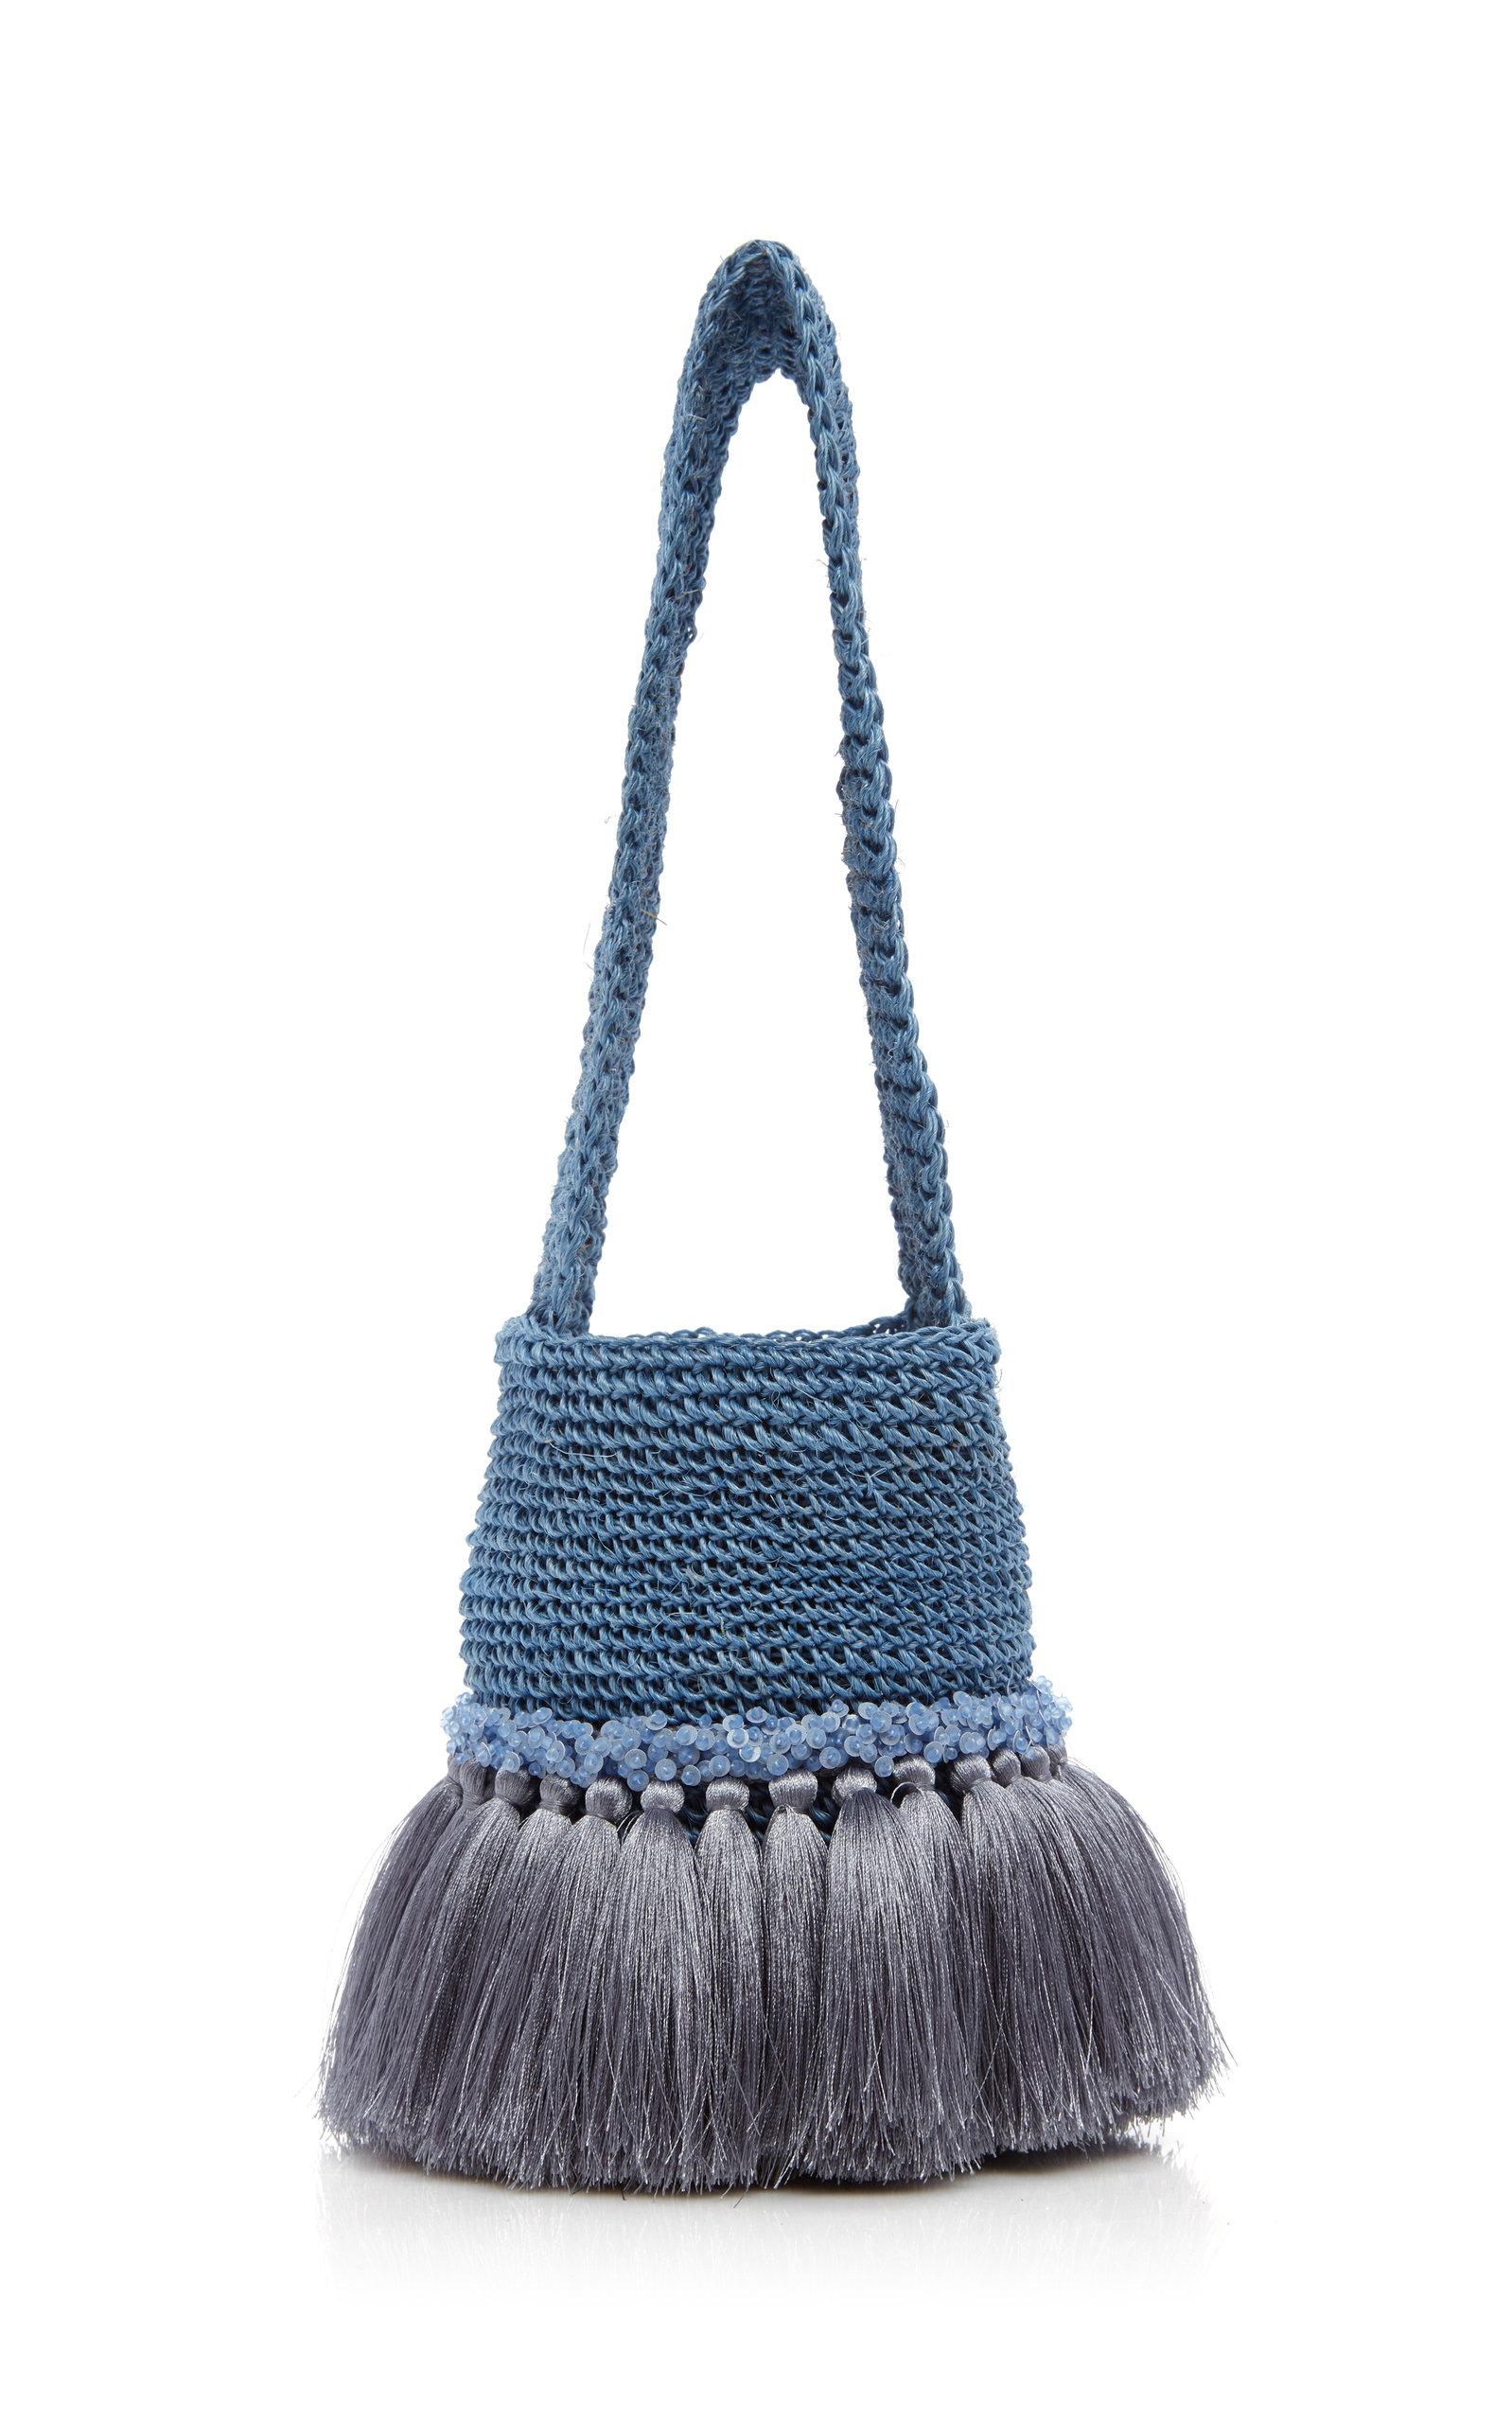 Little Paws Small Crochet Bucket Bag By Johanna Ortiz Moda Operandi